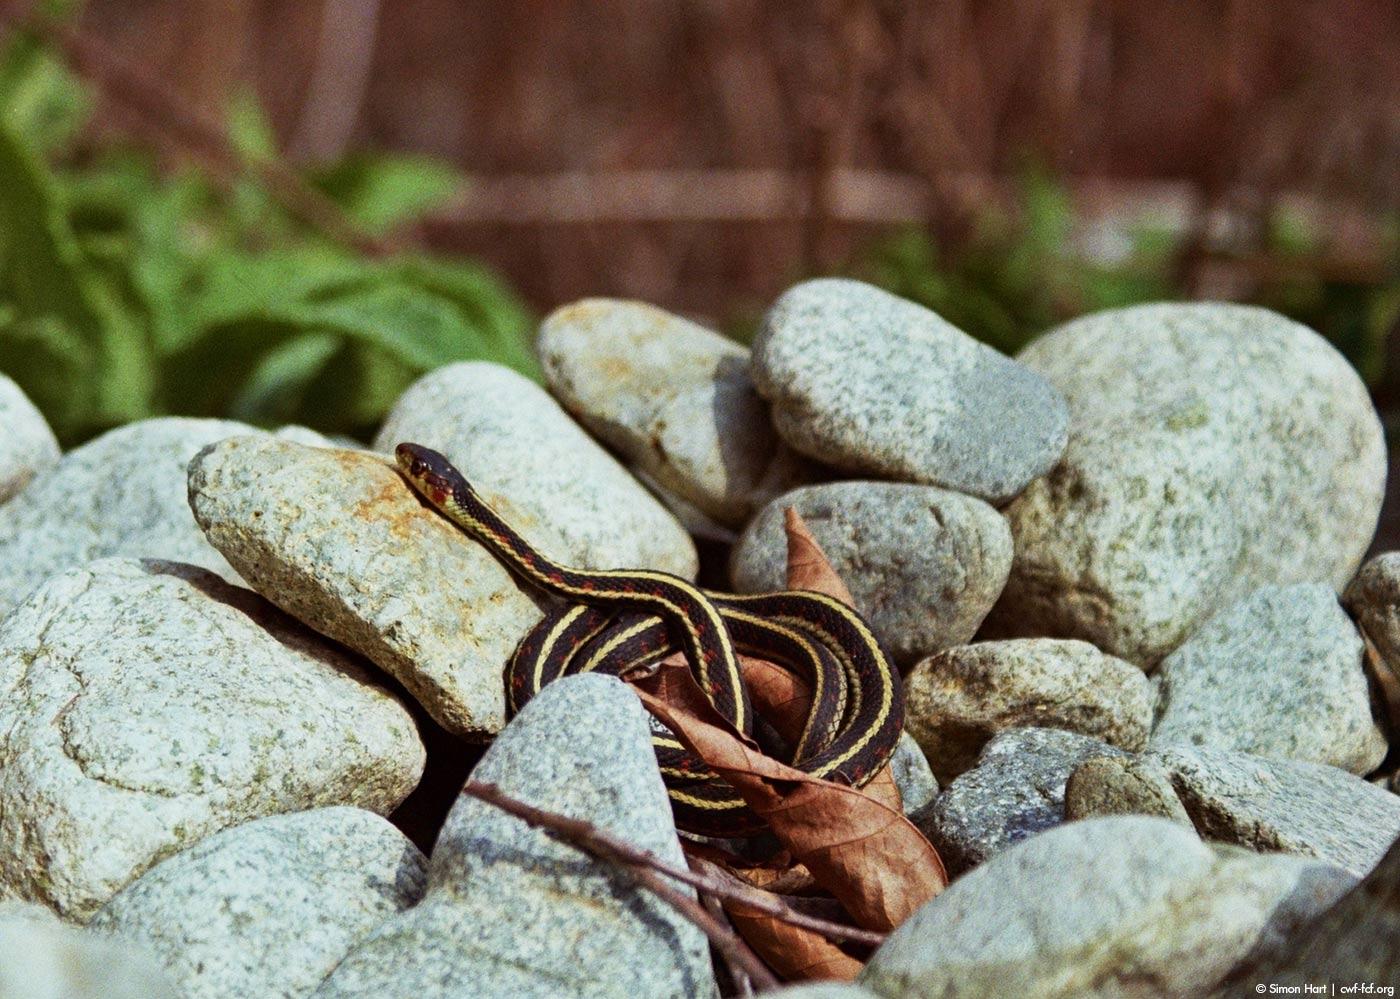 Canadian Wildlife Federation  Common Garter Snake 3de58ce75